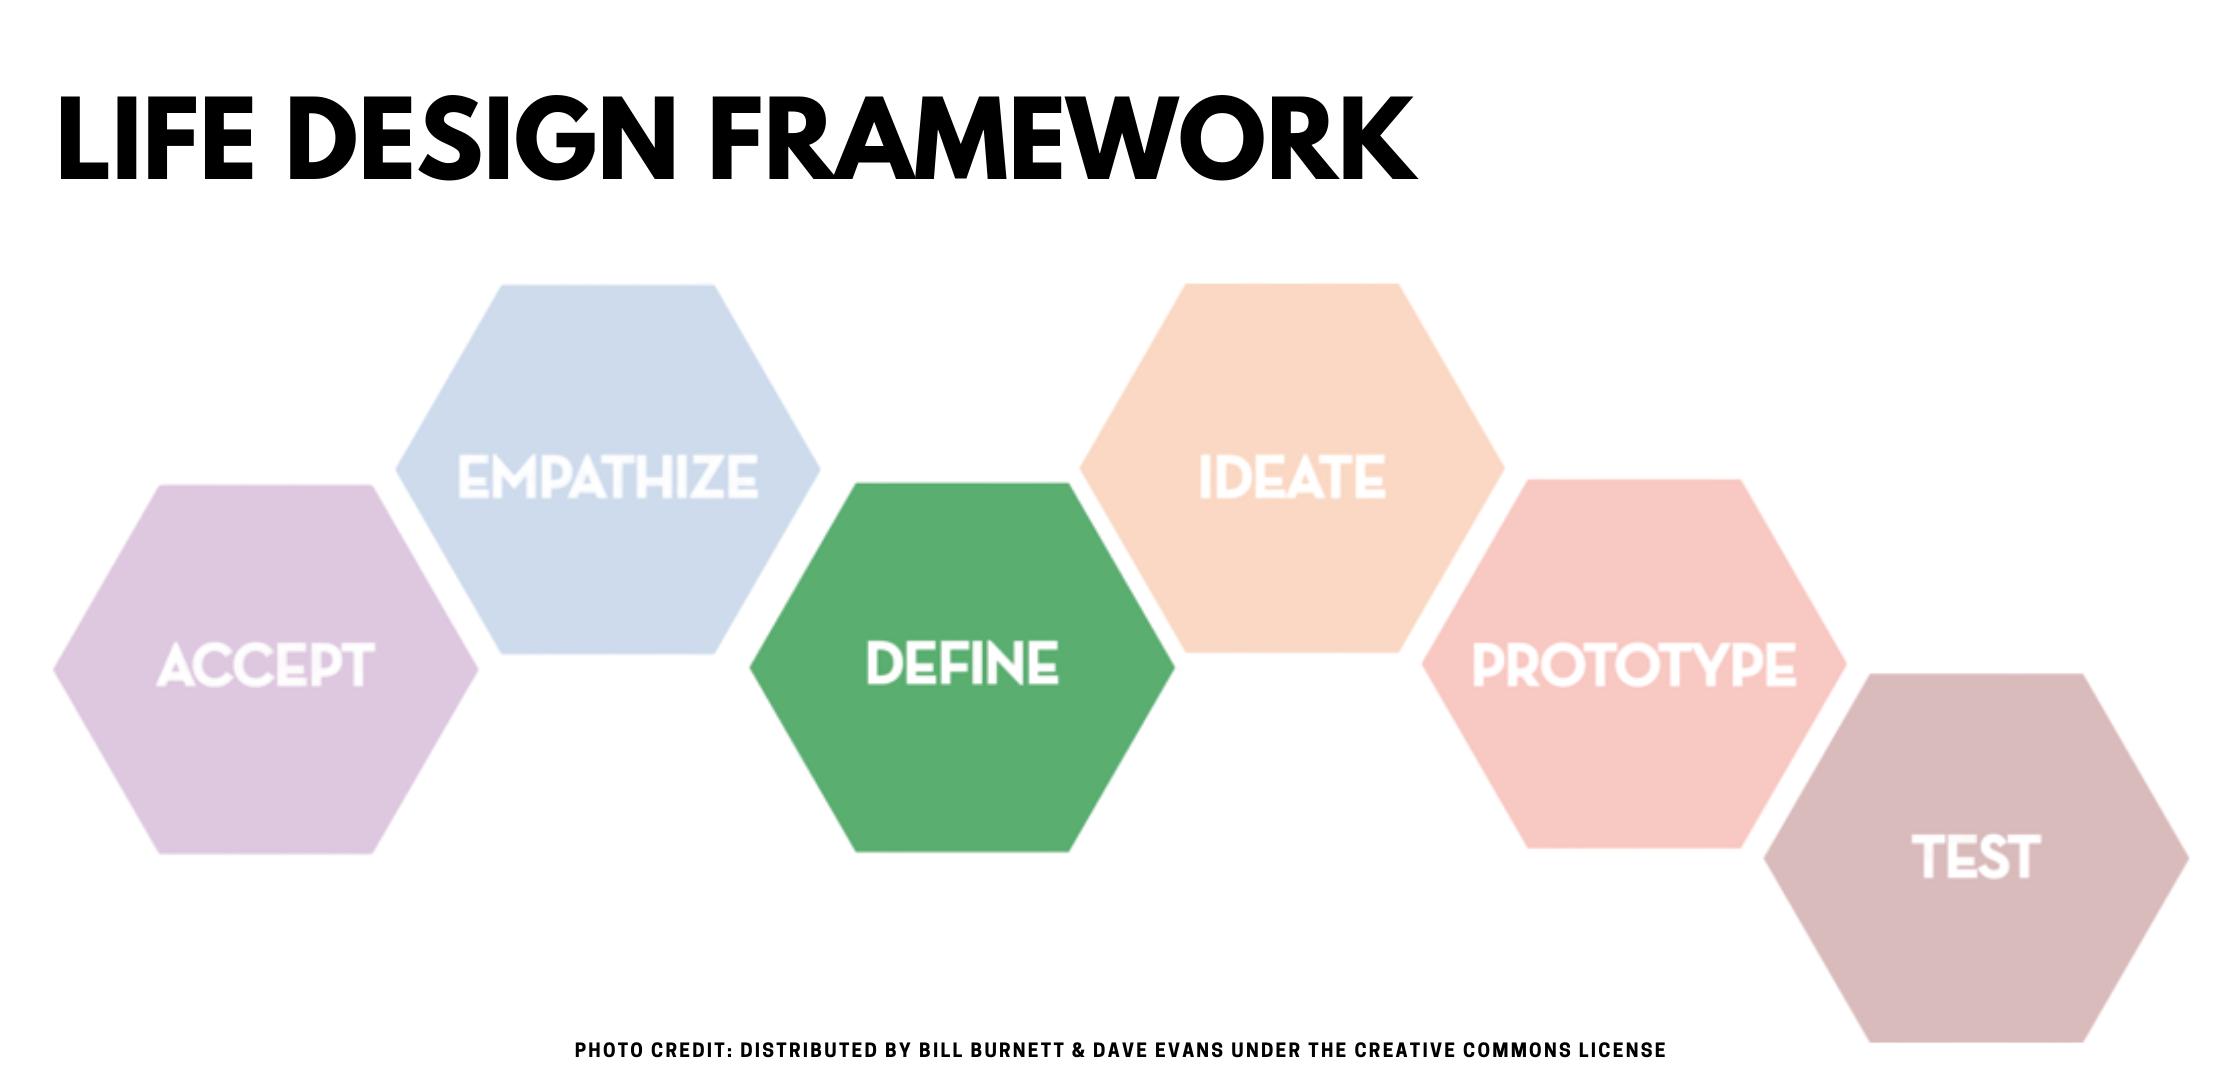 Life Design Framework